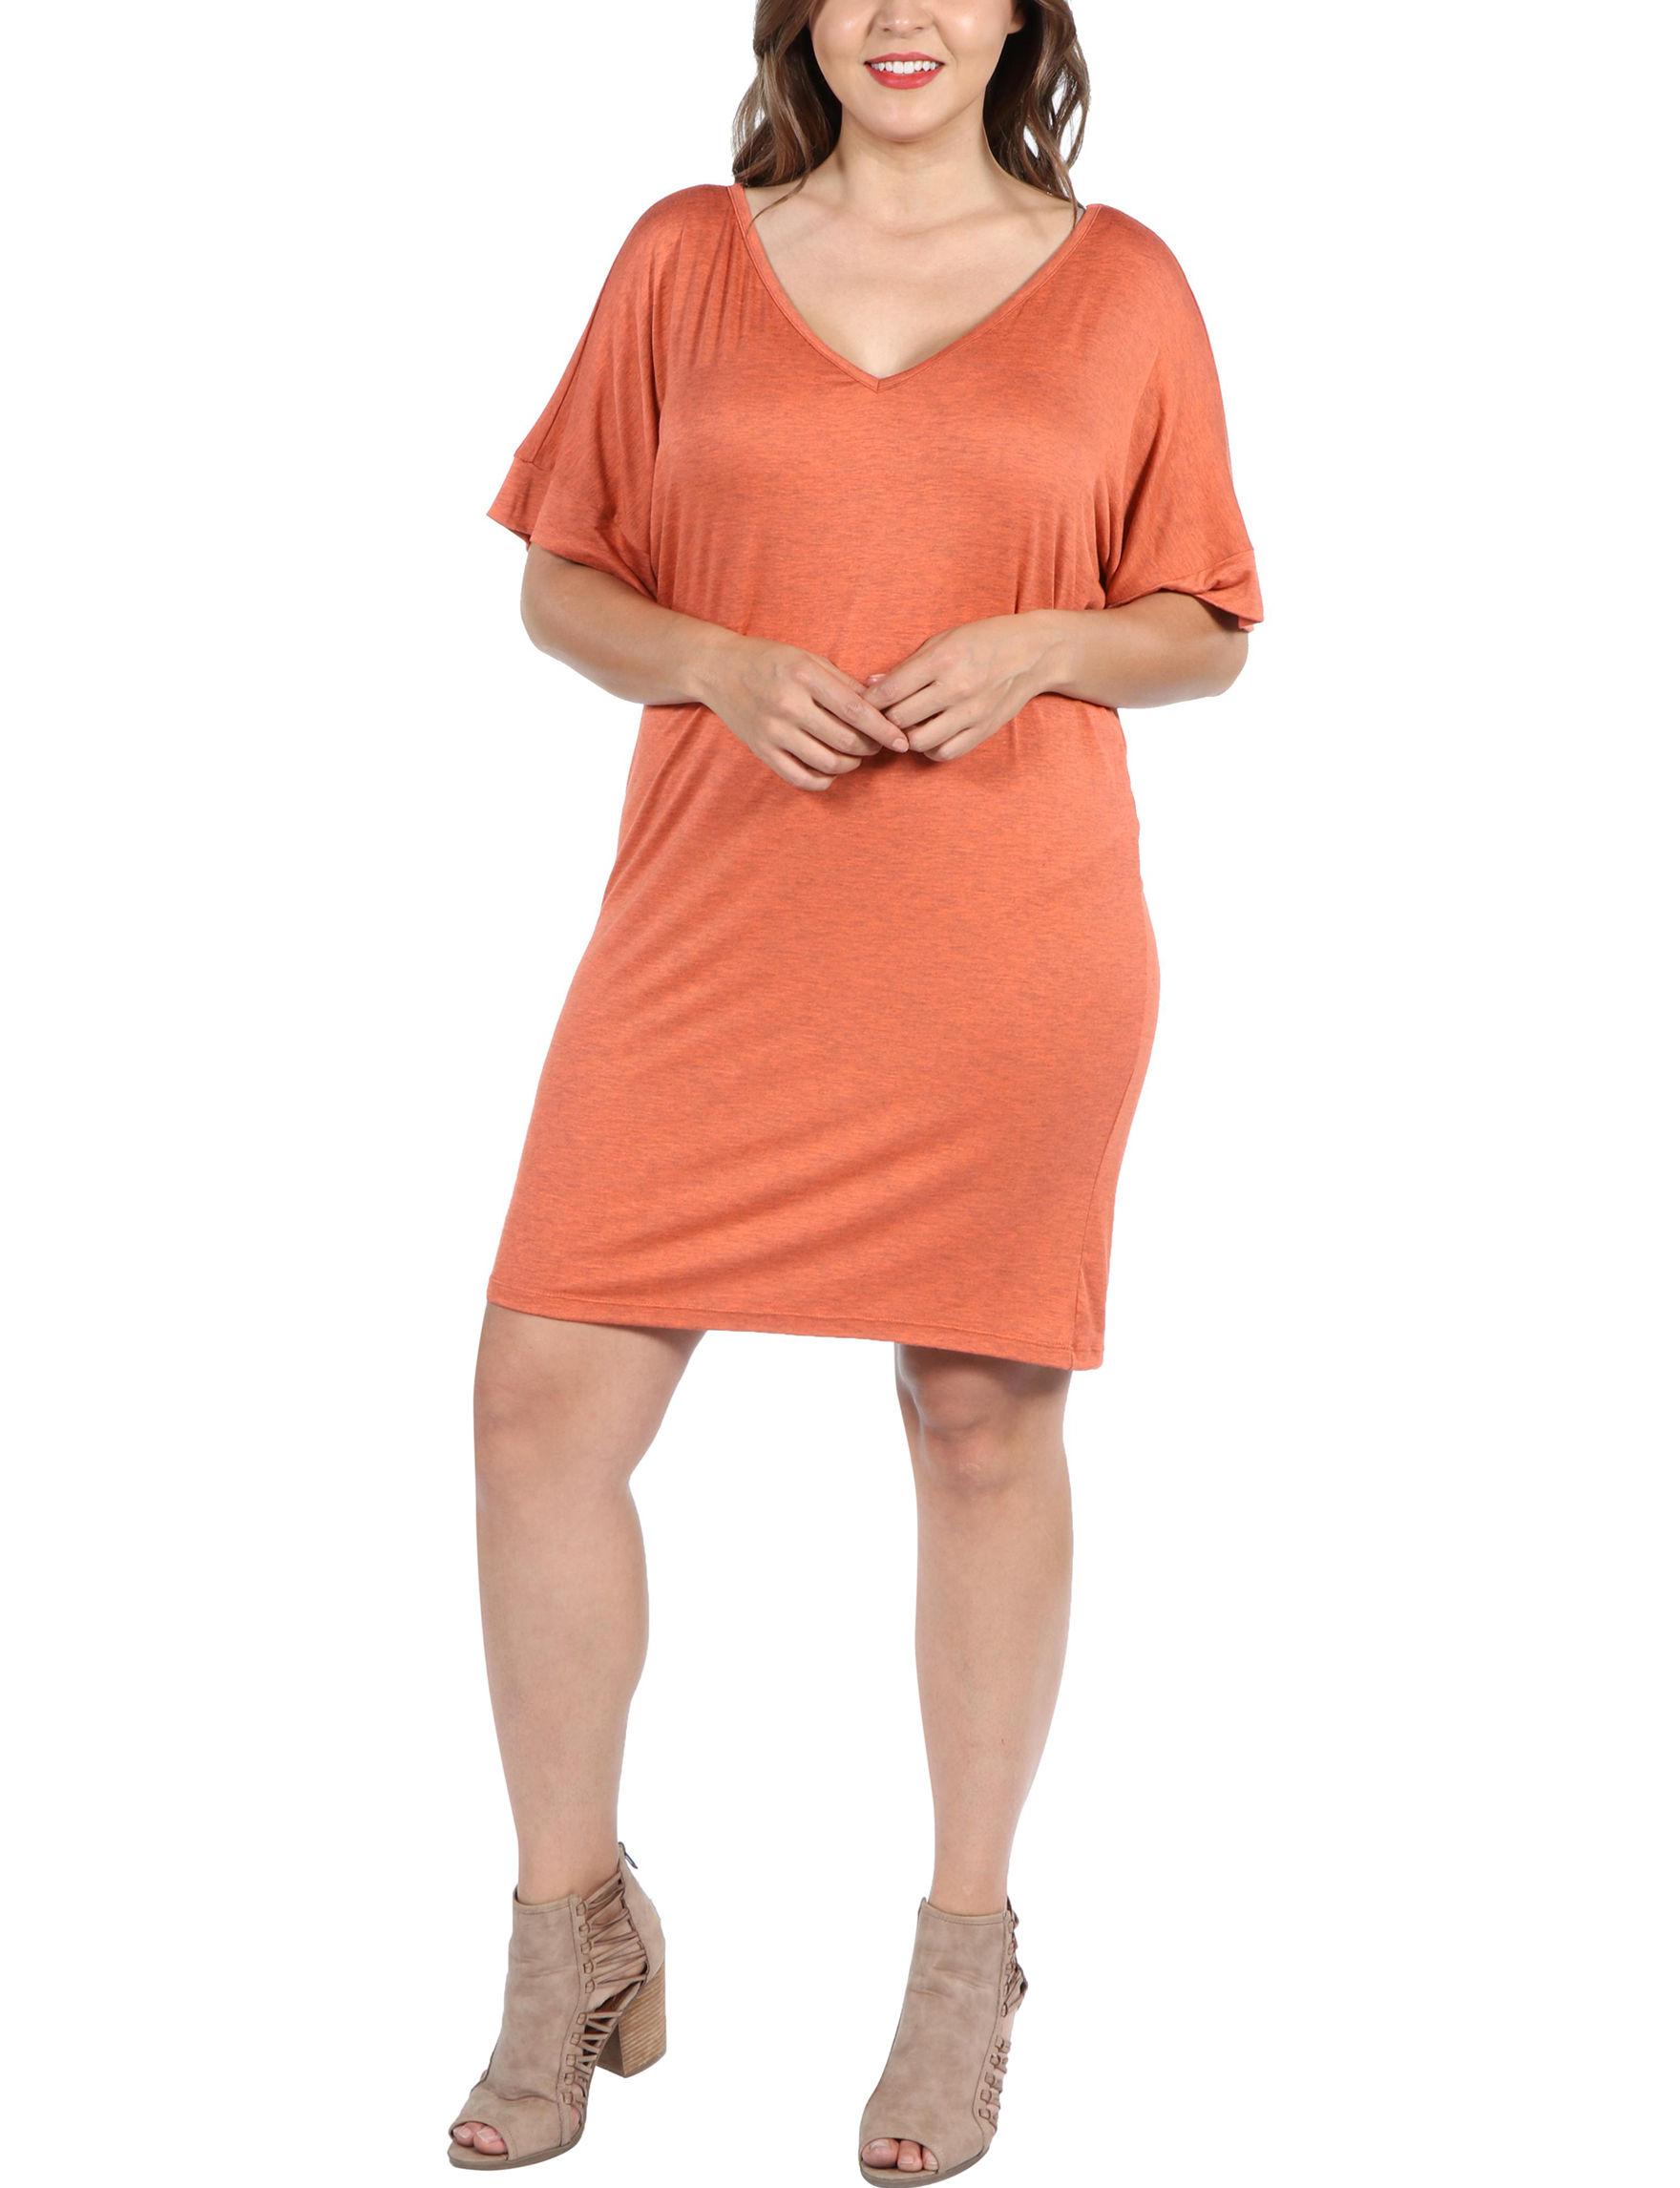 24Seven Comfort Apparel Orange Cocktail & Party Shift Dresses